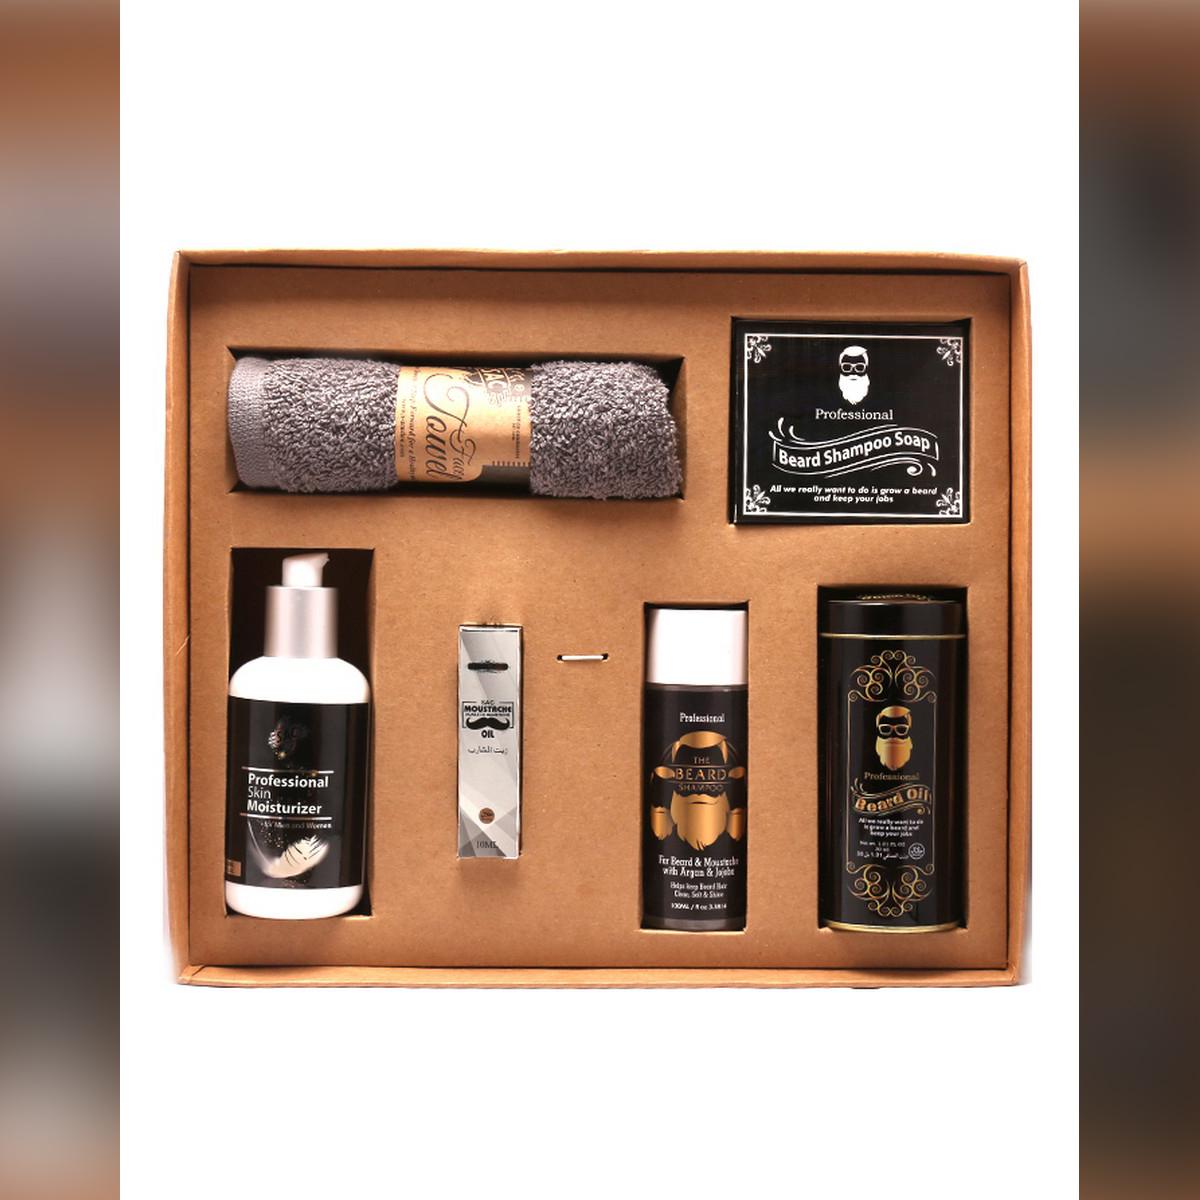 Beard kit - Grooming Kit  - Beard Oil Strong + Moustache Oil + Beard Bar + Beard Shampoo + Skin Lotion + Face Towel - SAC